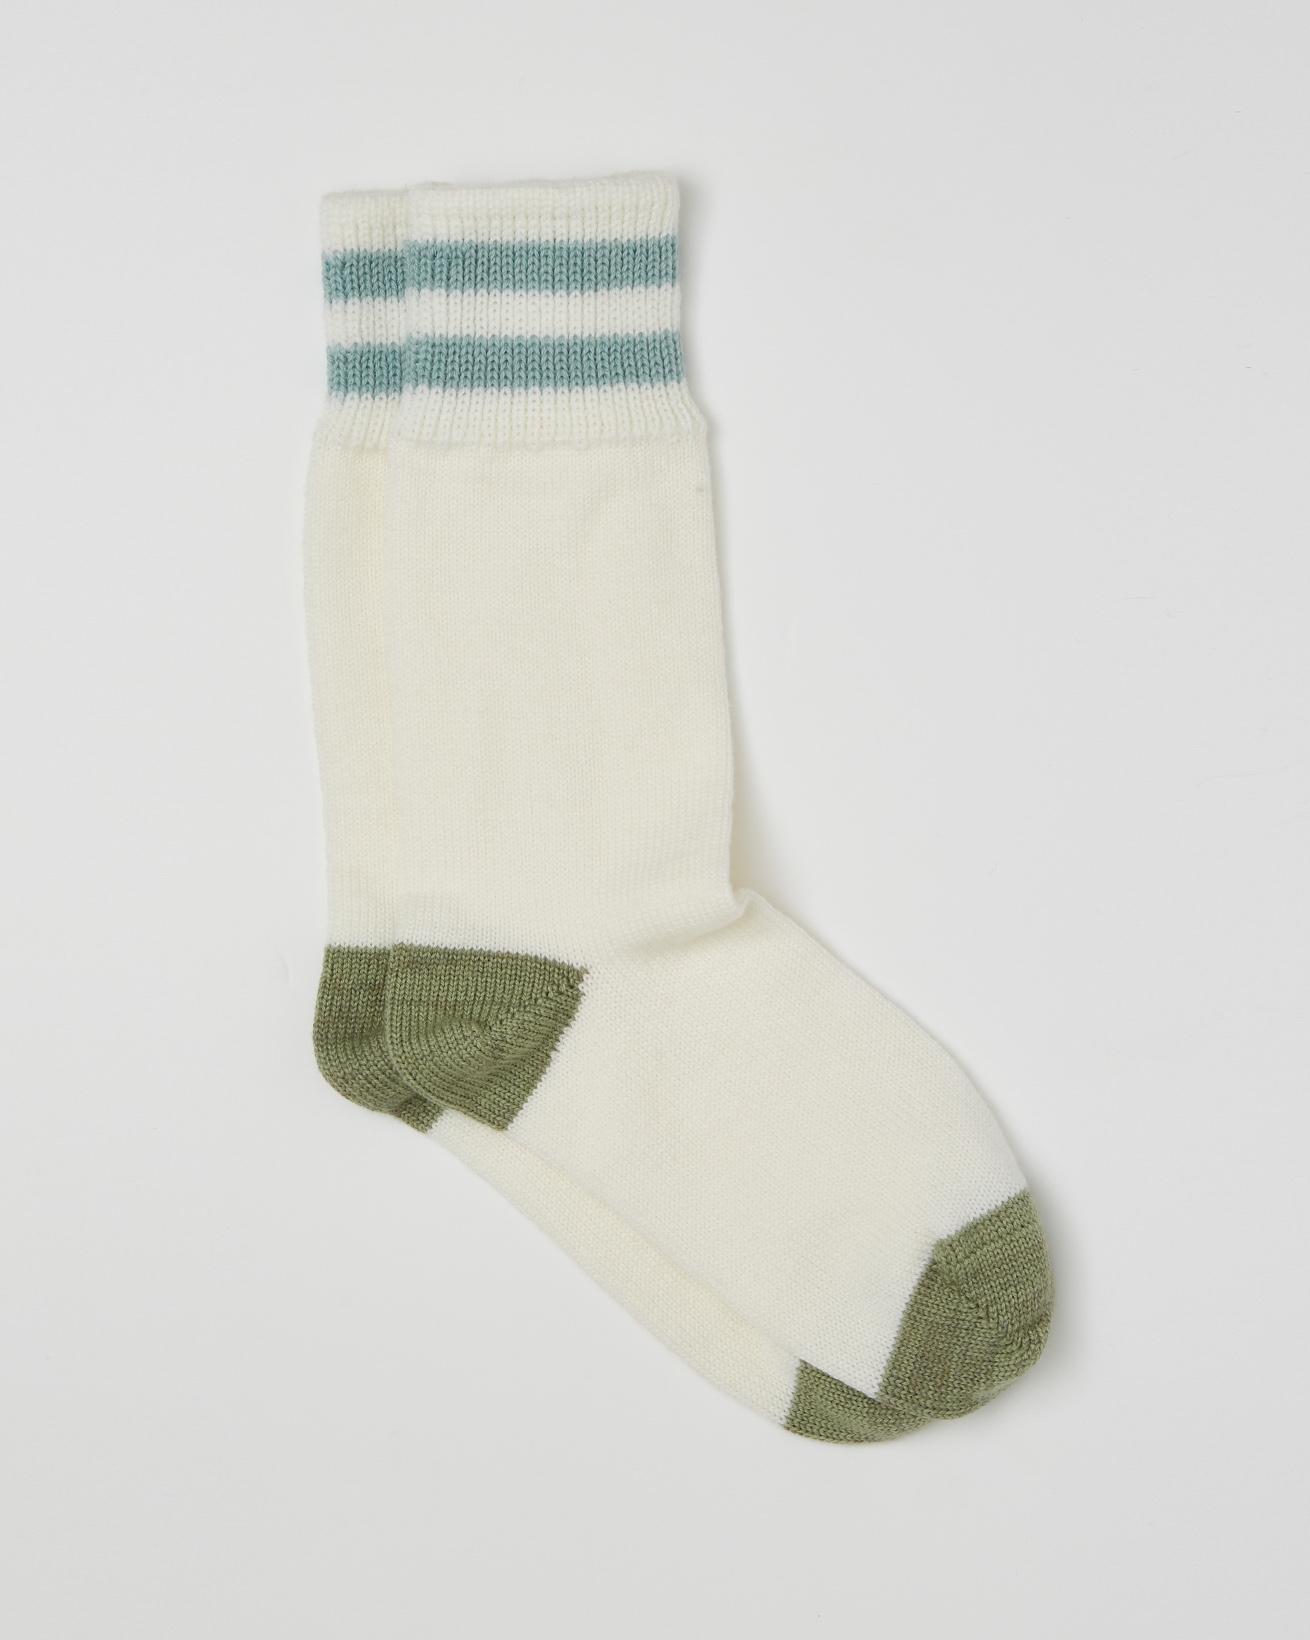 Ladies Merino Cotton Socks - Size Medium - Winter White, Sage - 2466